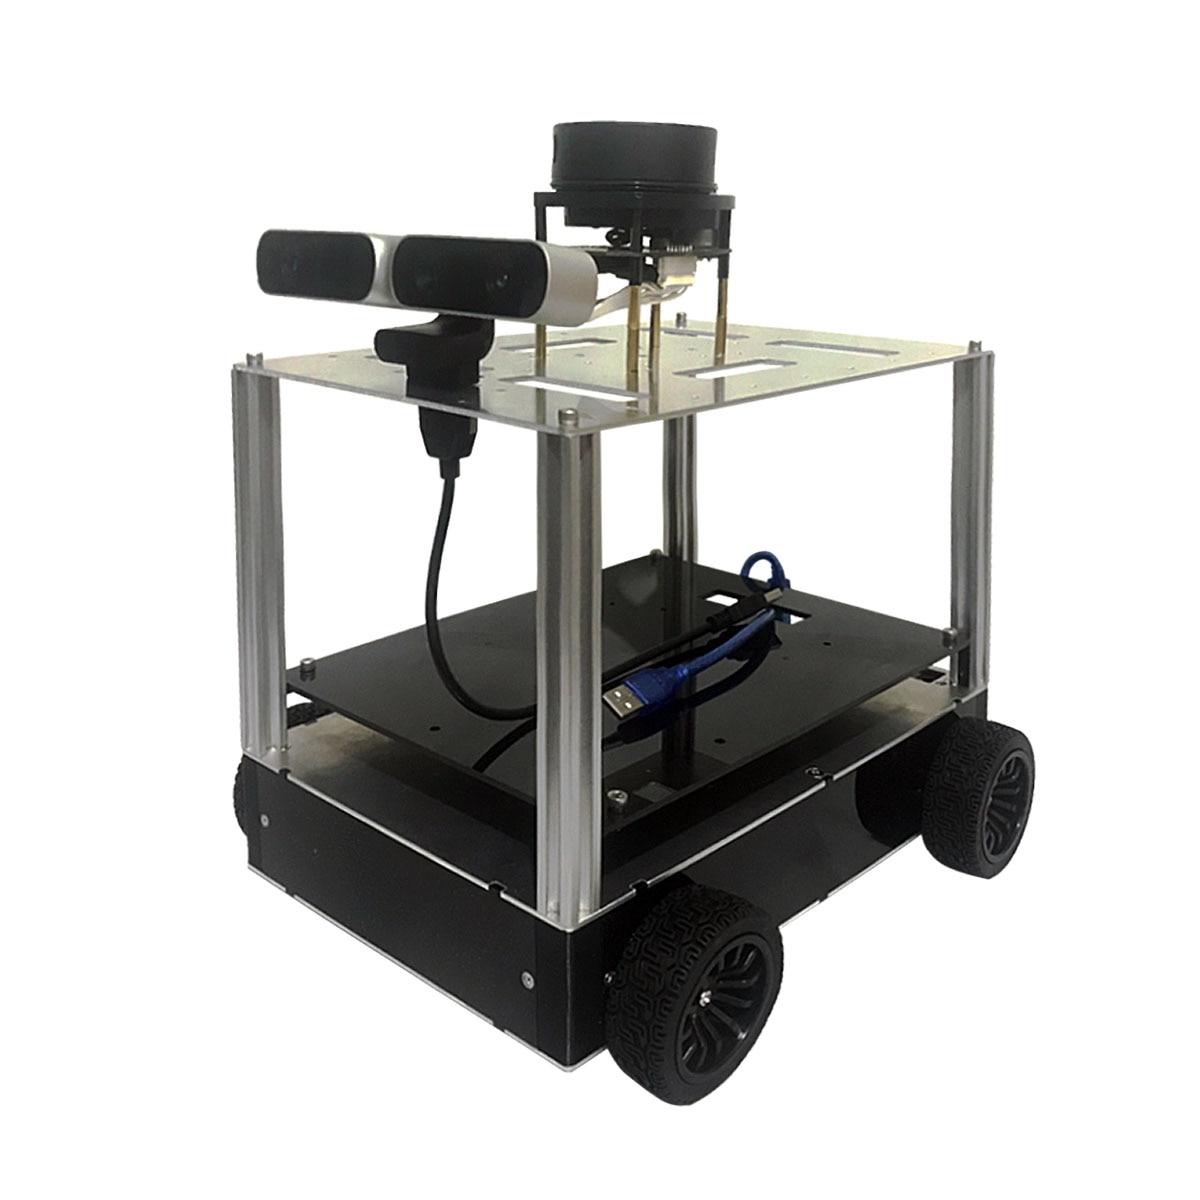 ROS Robot-رباعي الدفع للسيارة ، هيكل سيارة مغلق بالكامل ، رادار ، كاميرا عمق ، رسم خرائط ، مخصص